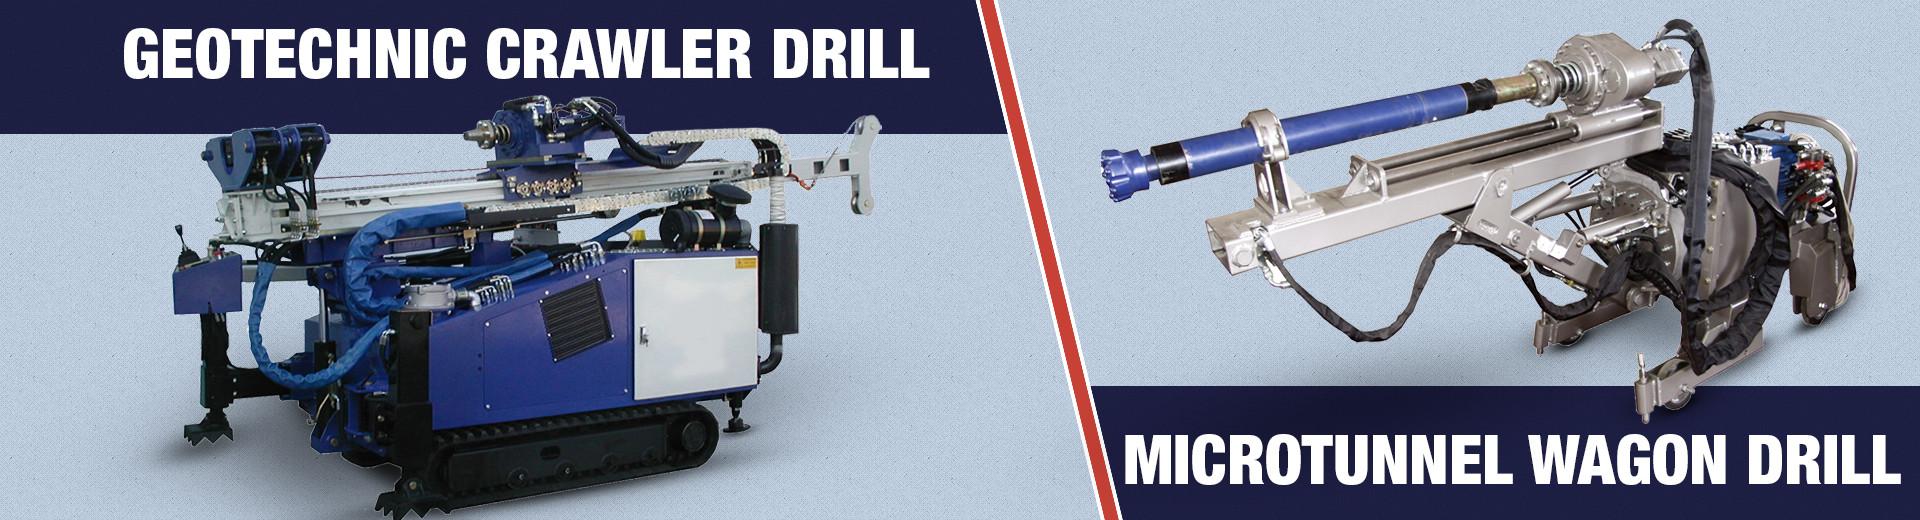 Geotechnic Crawler Drill